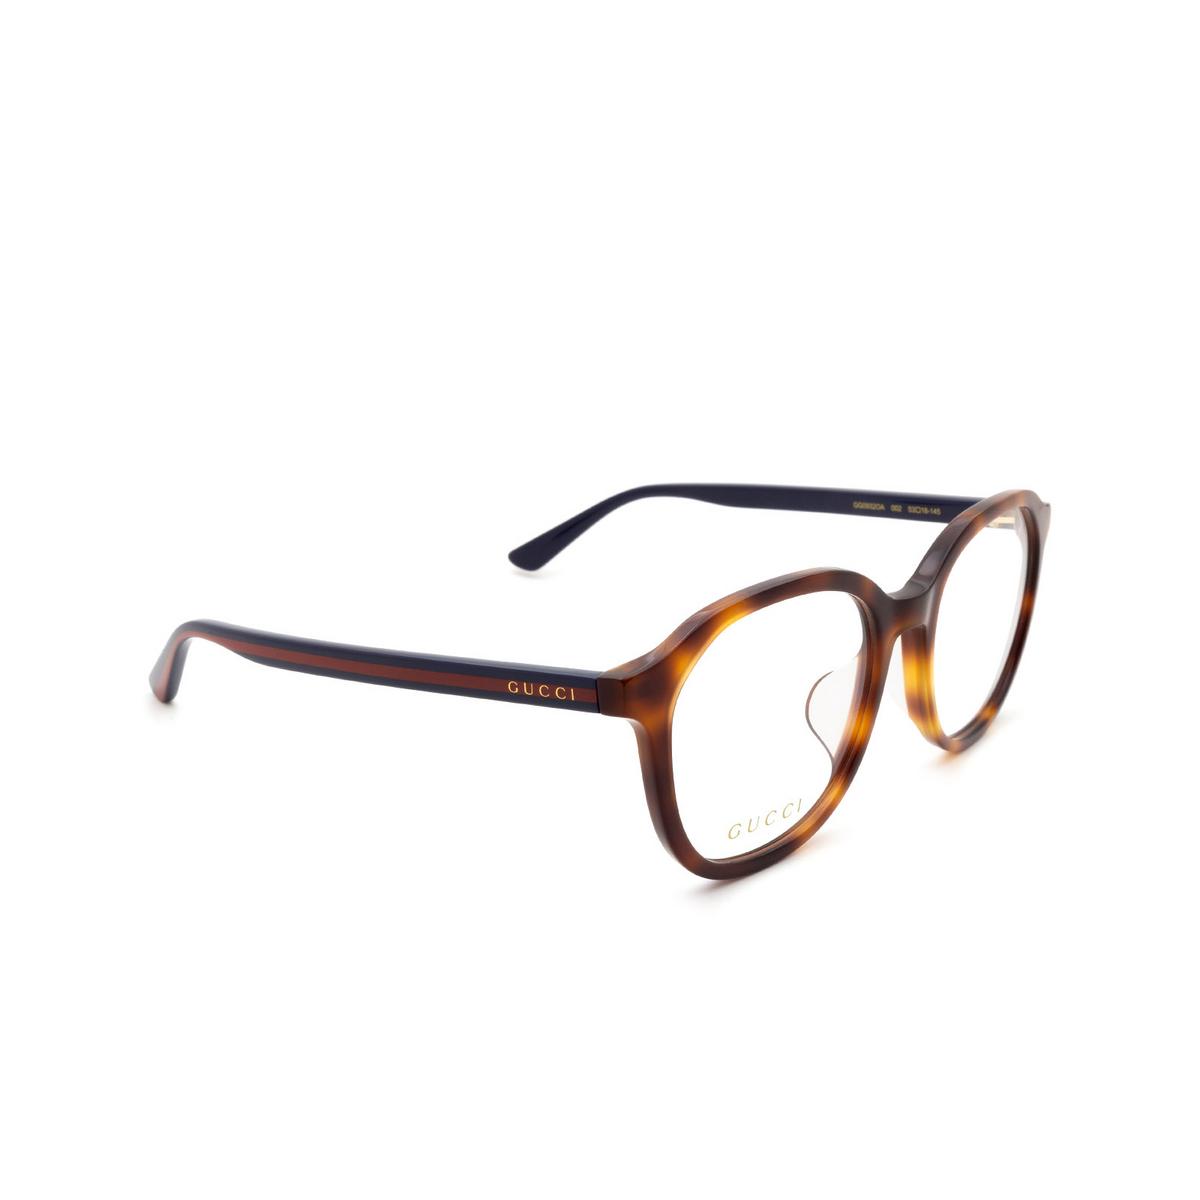 Gucci® Round Eyeglasses: GG0932OA color Havana 002 - three-quarters view.